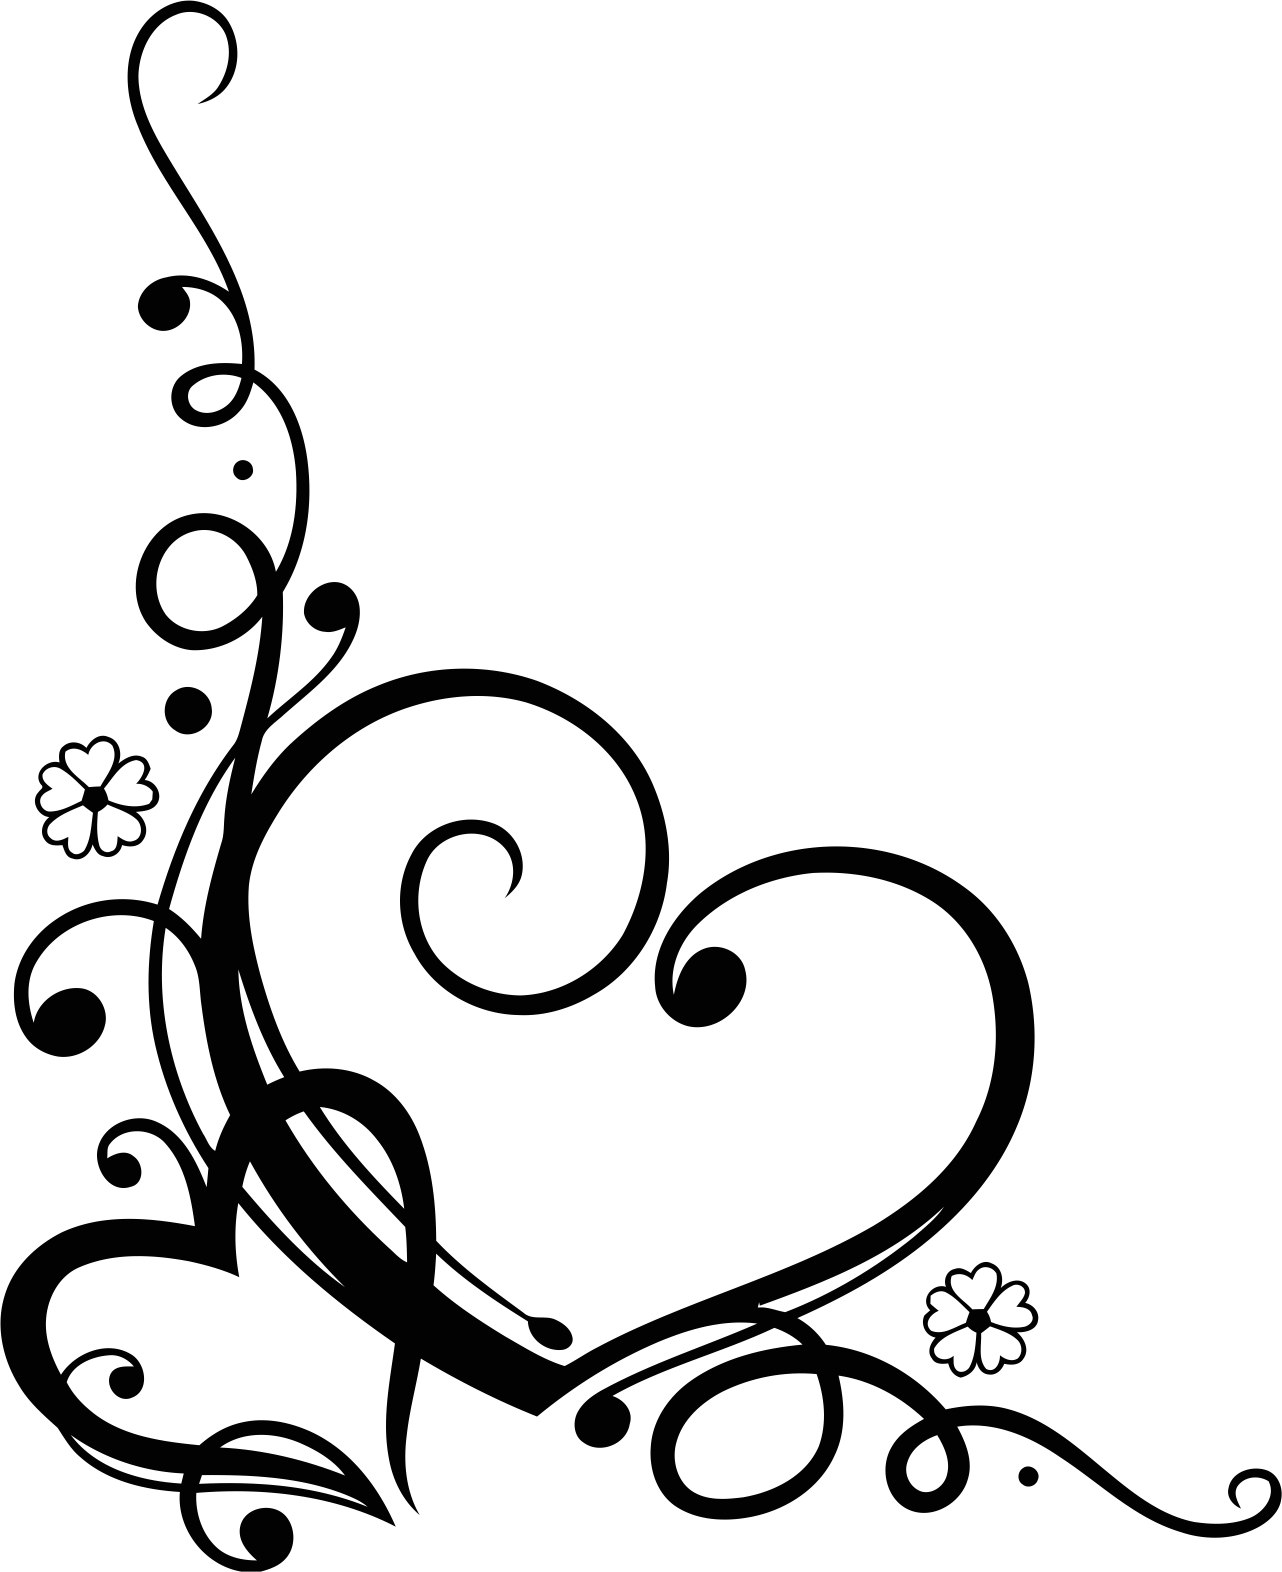 Love Heart Floral Swirl Free CDR Vectors Art